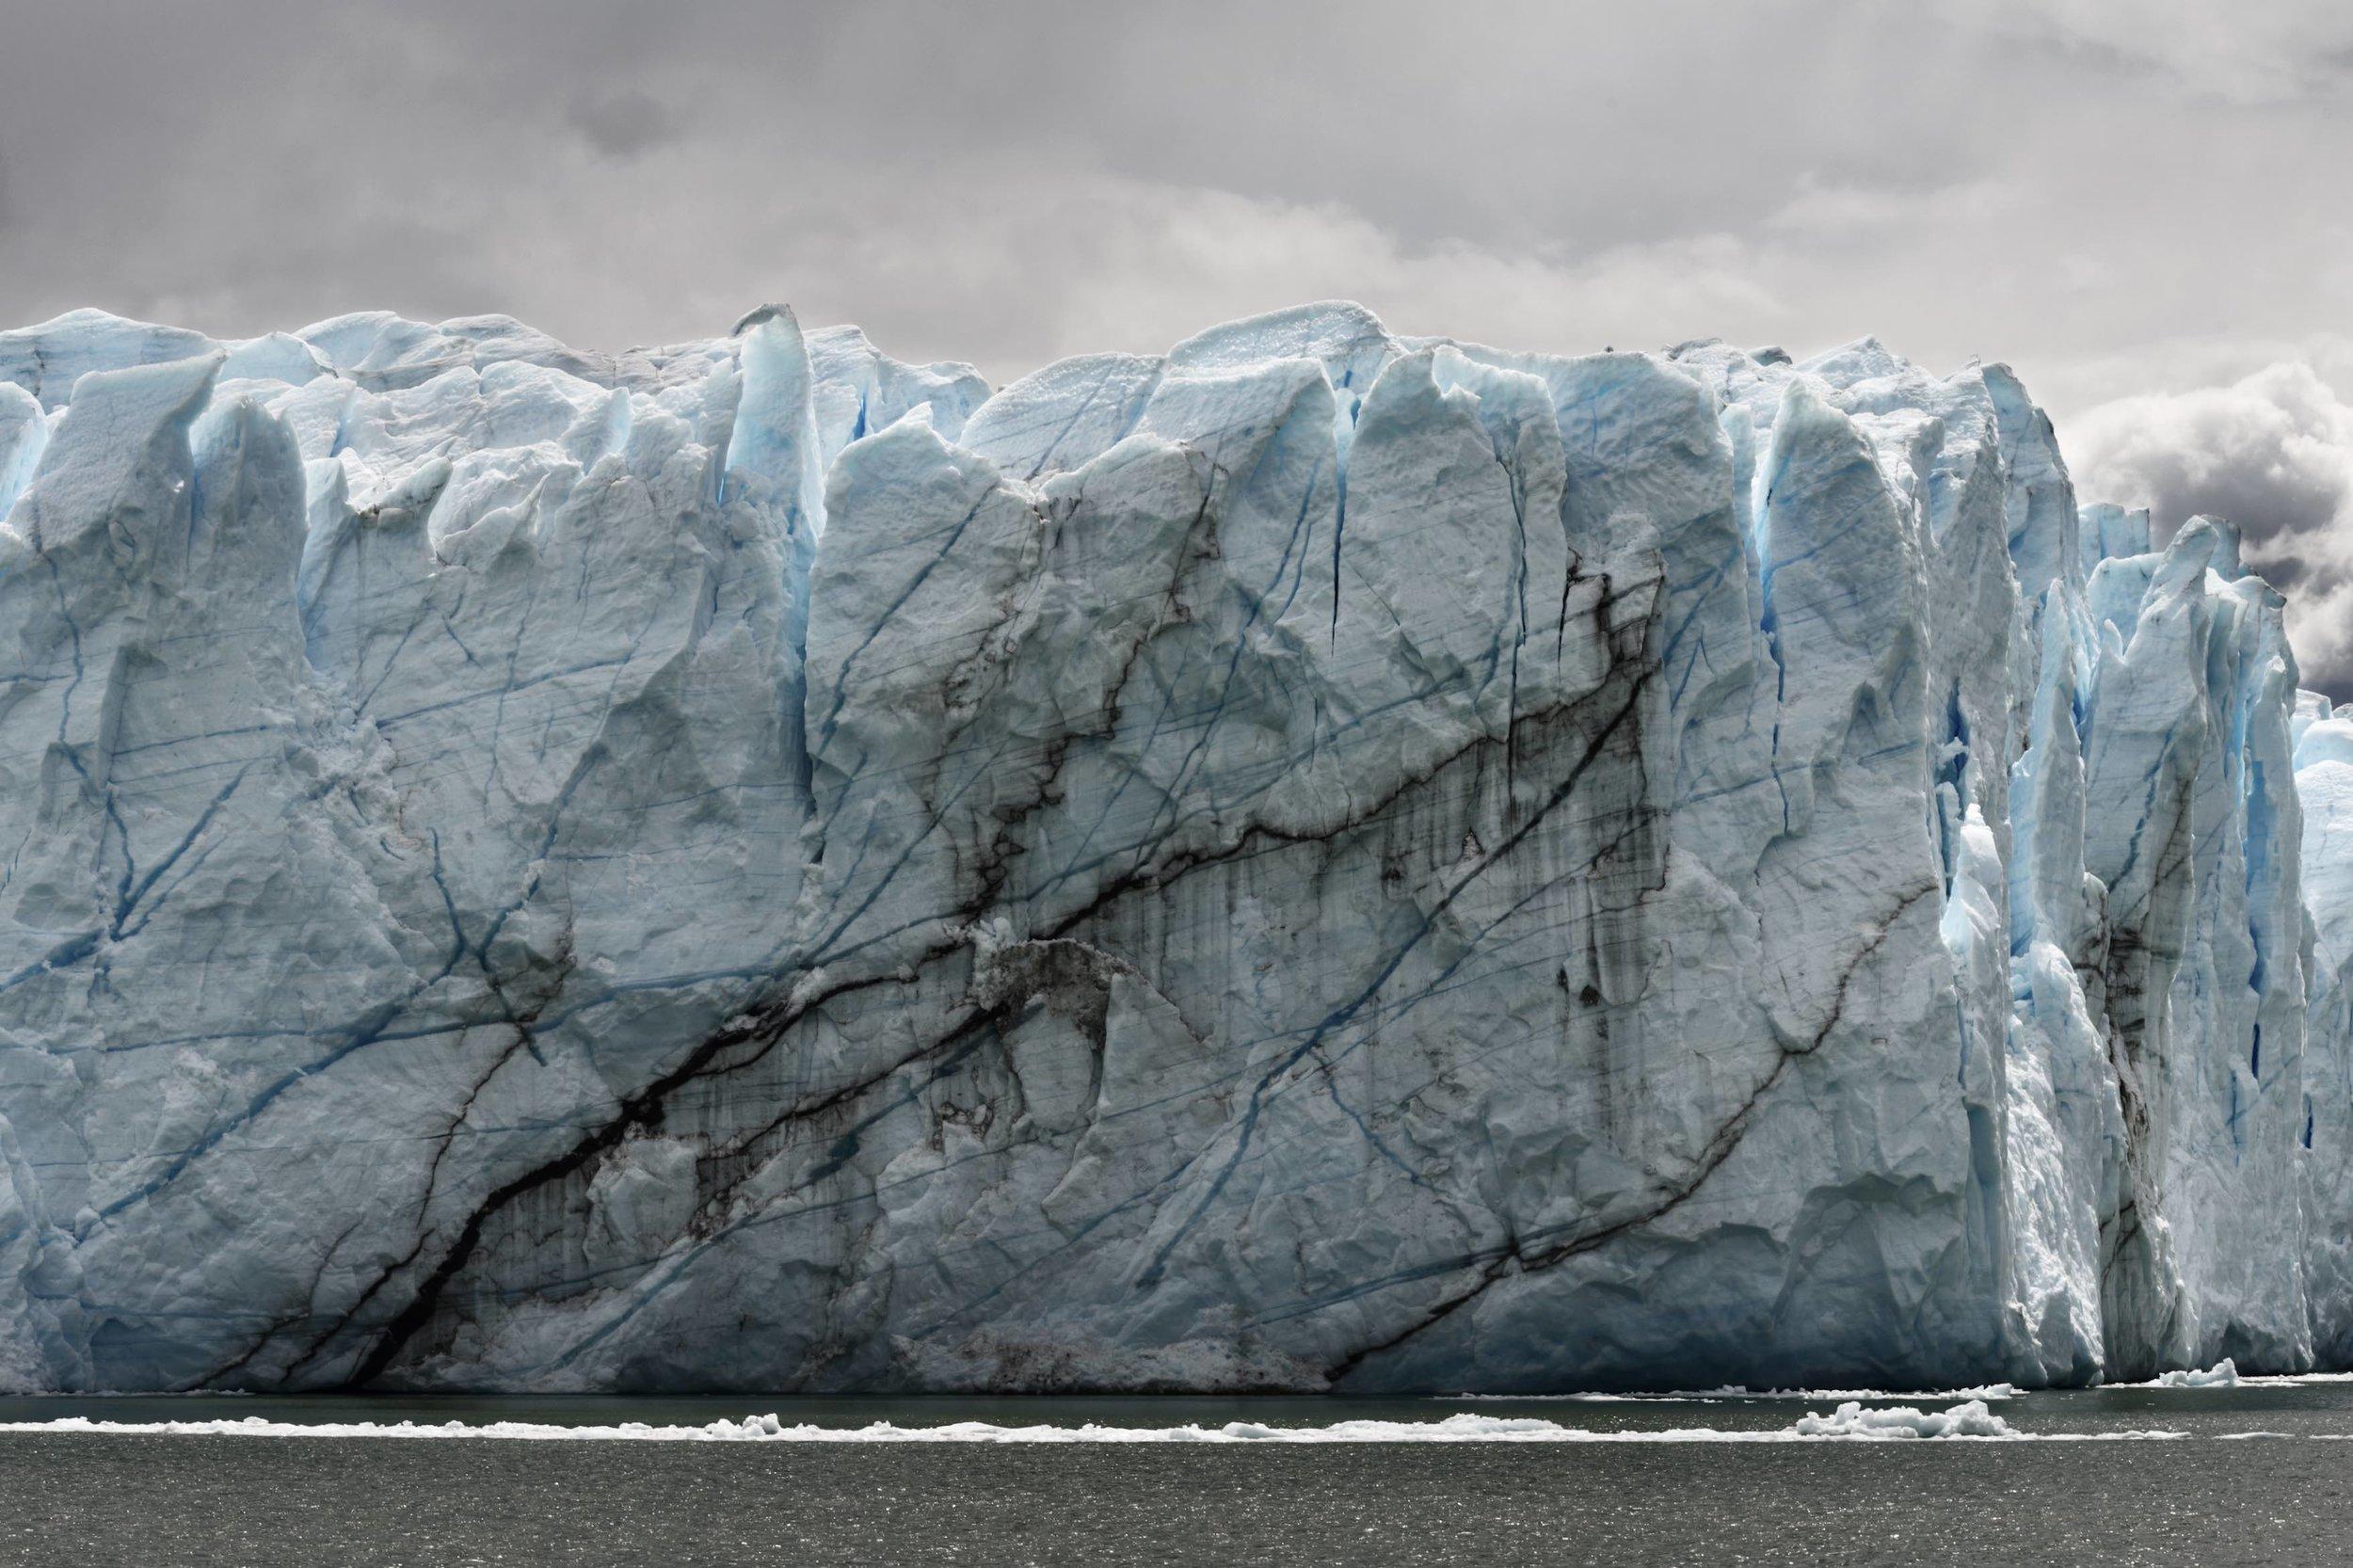 Glacier Wall, Patagonia, 2016